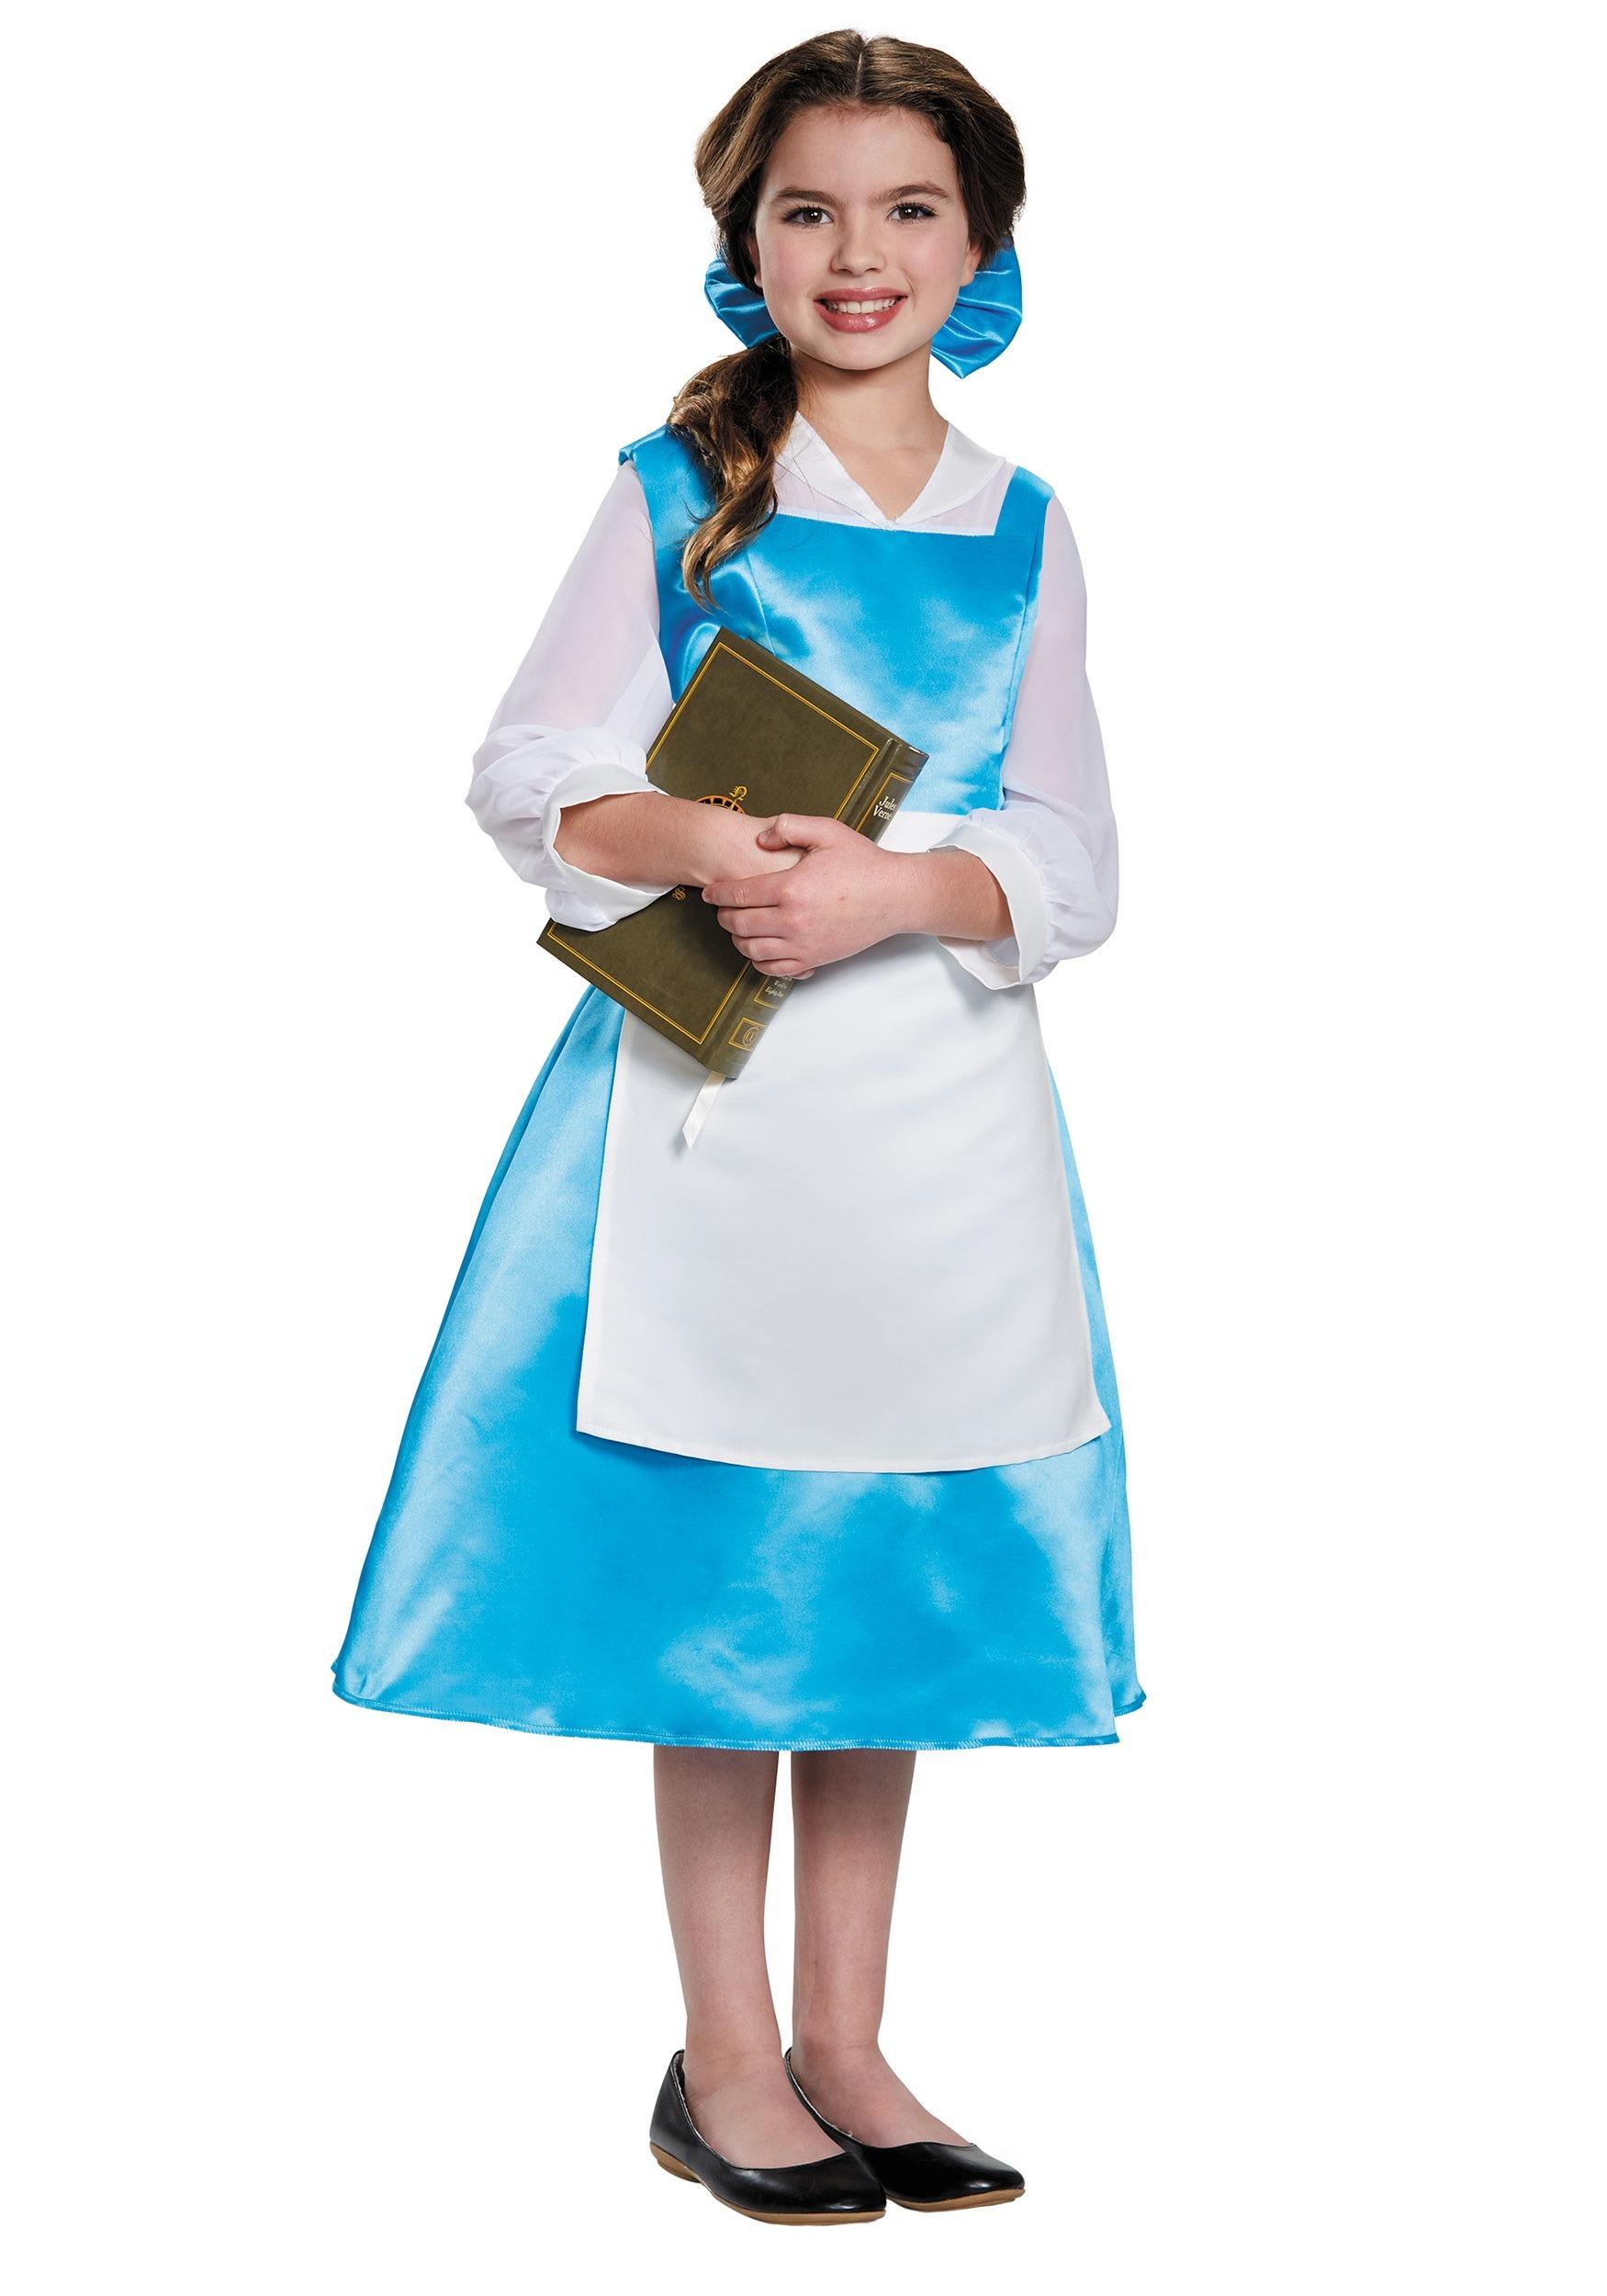 Belle Blue Costume Dress for Tween Girls